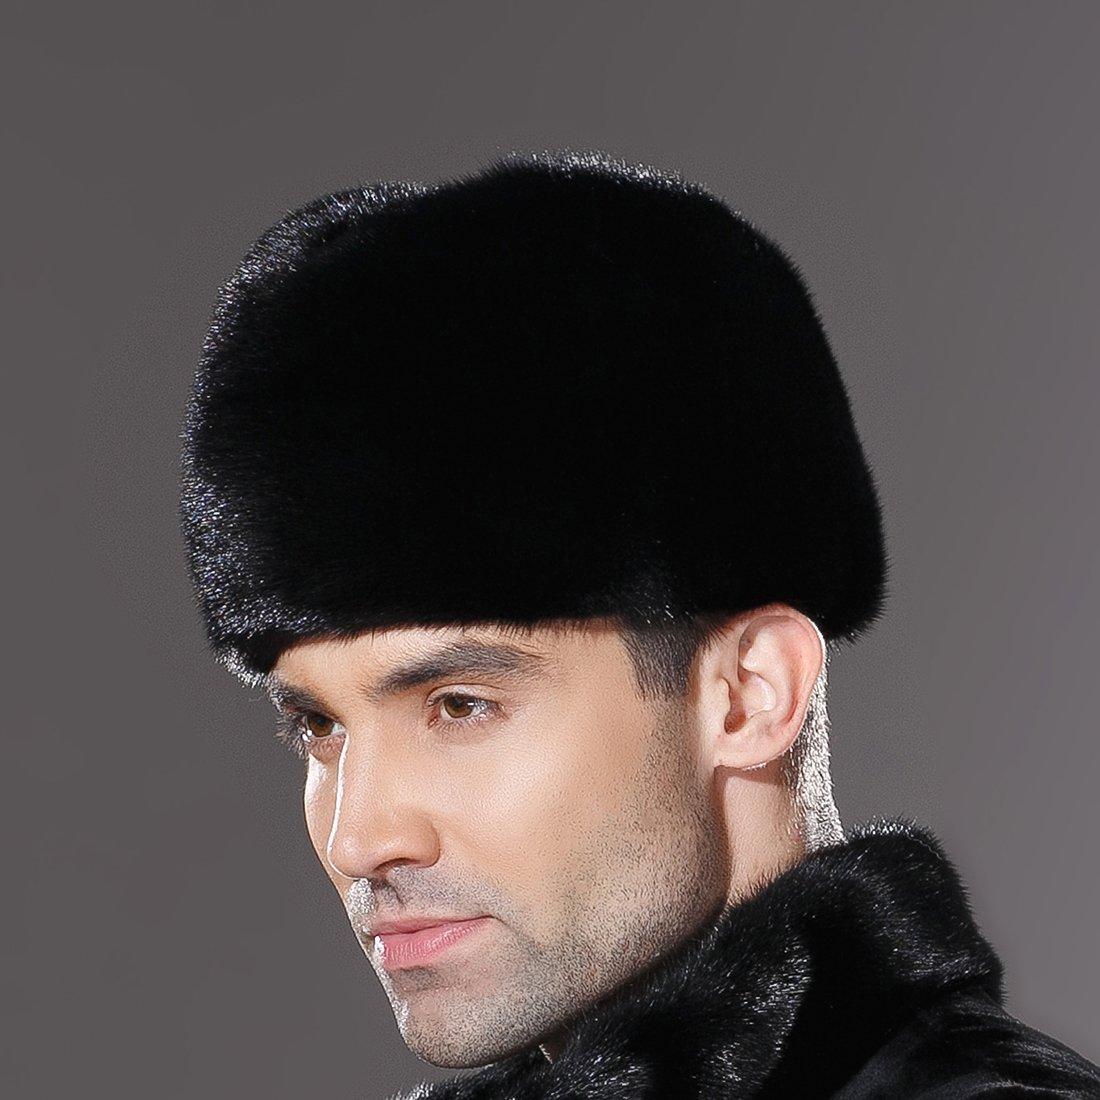 URSFUR Mens Winter Russian Cossack Hat Real Mink Fur Cap Black by URSFUR (Image #7)